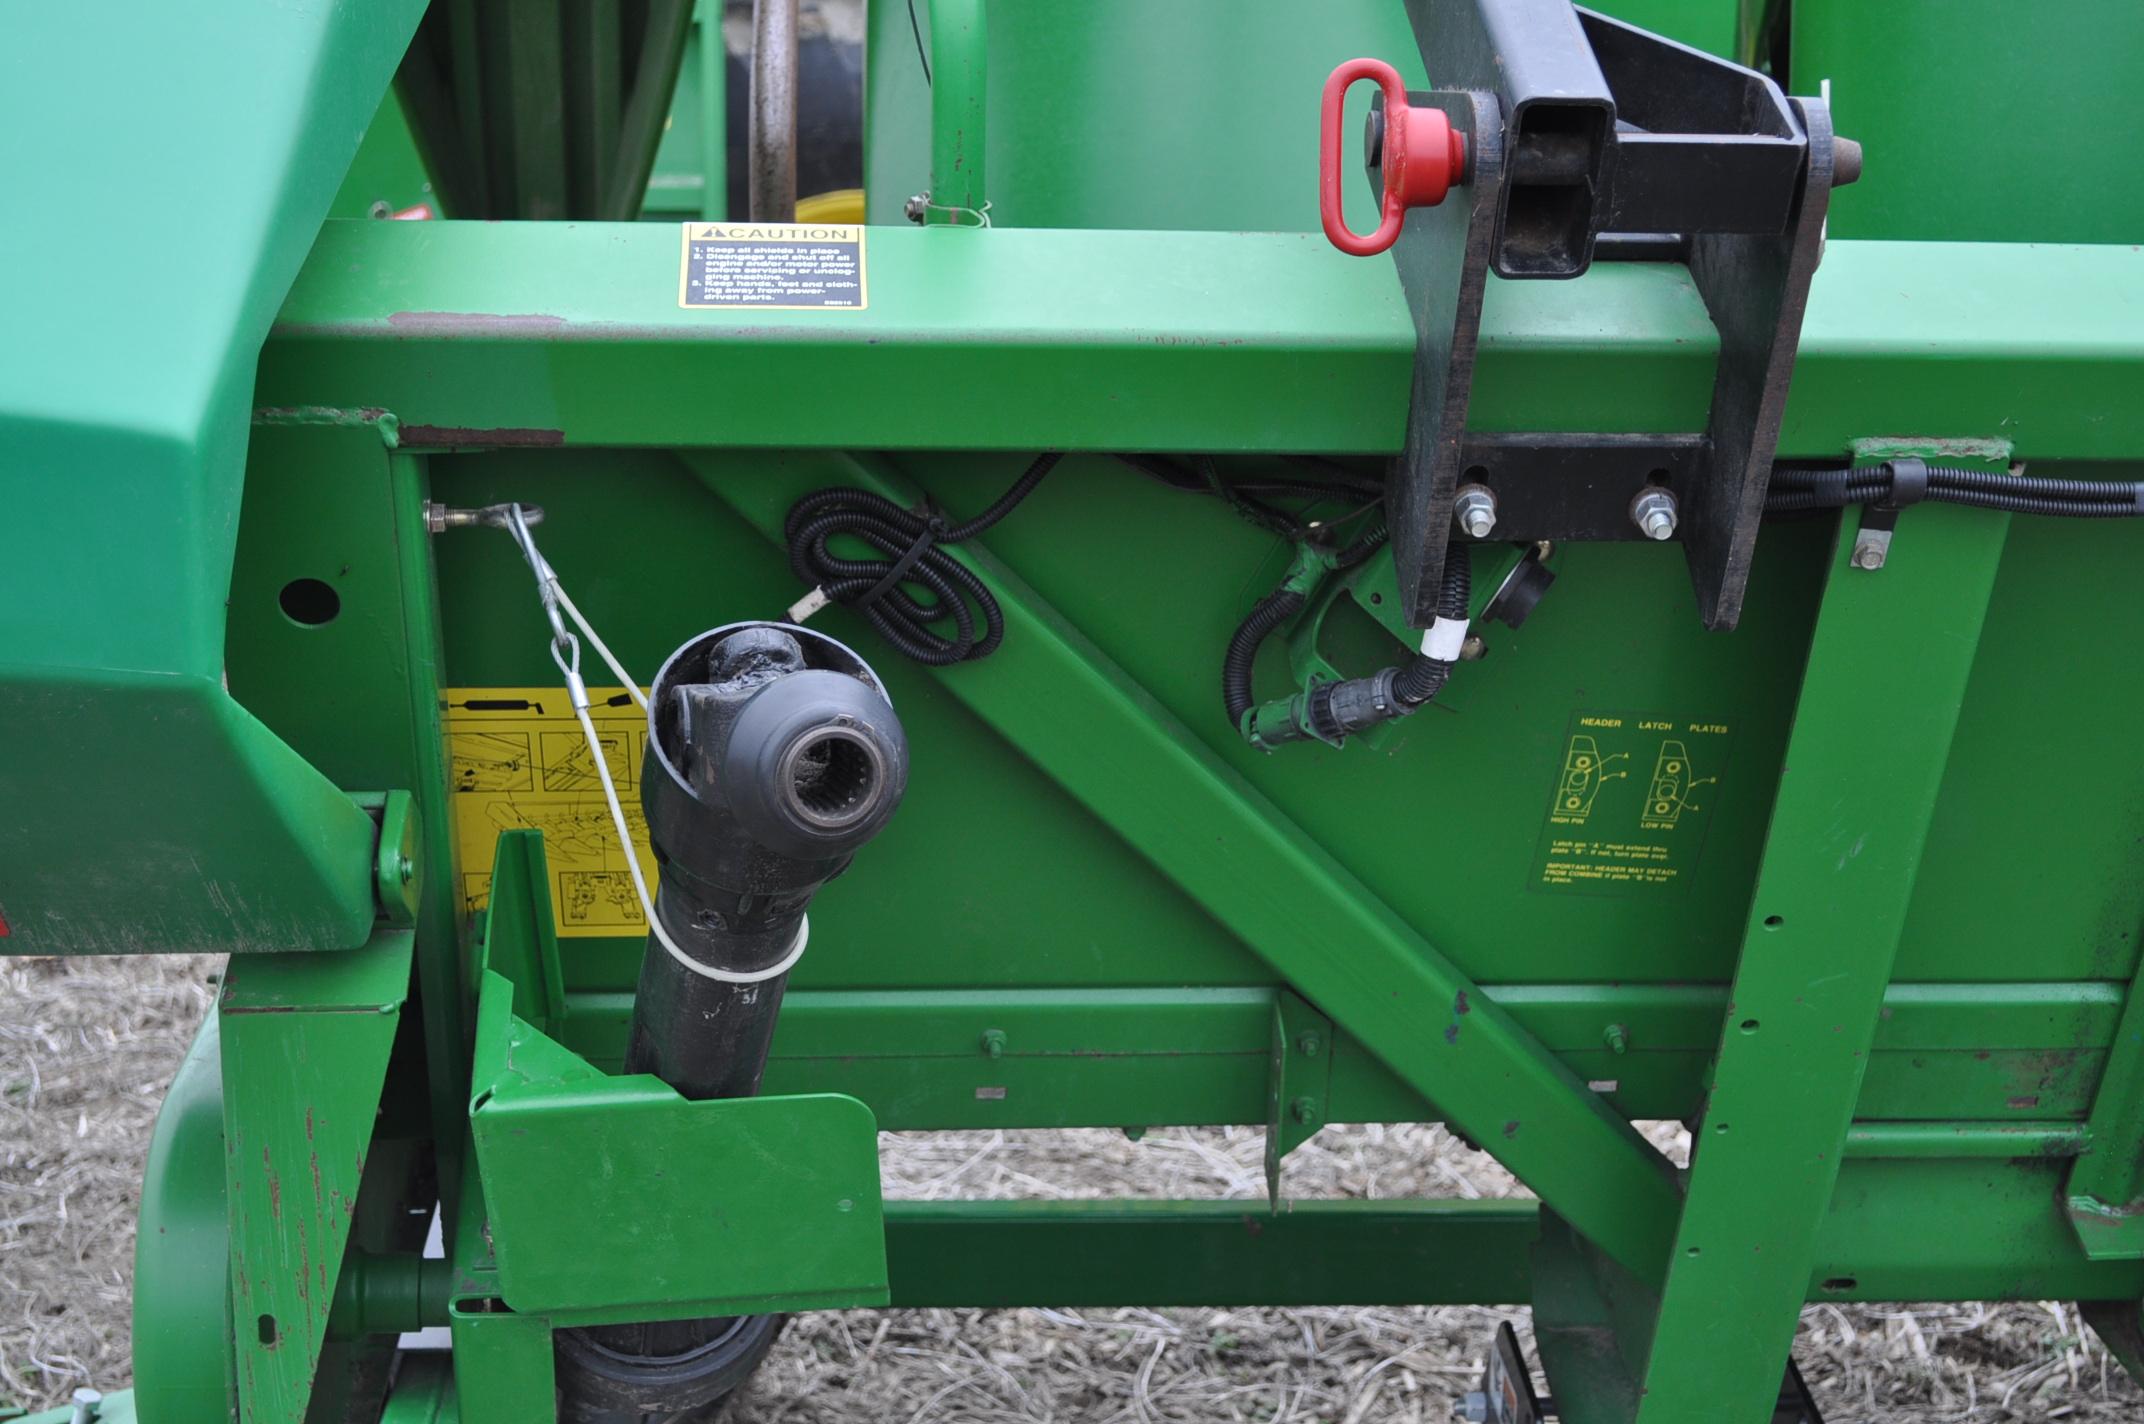 John Deere 693 corn head, poly, hyd drive, down corn reel, pto shafts, SN 655654 - Image 6 of 17